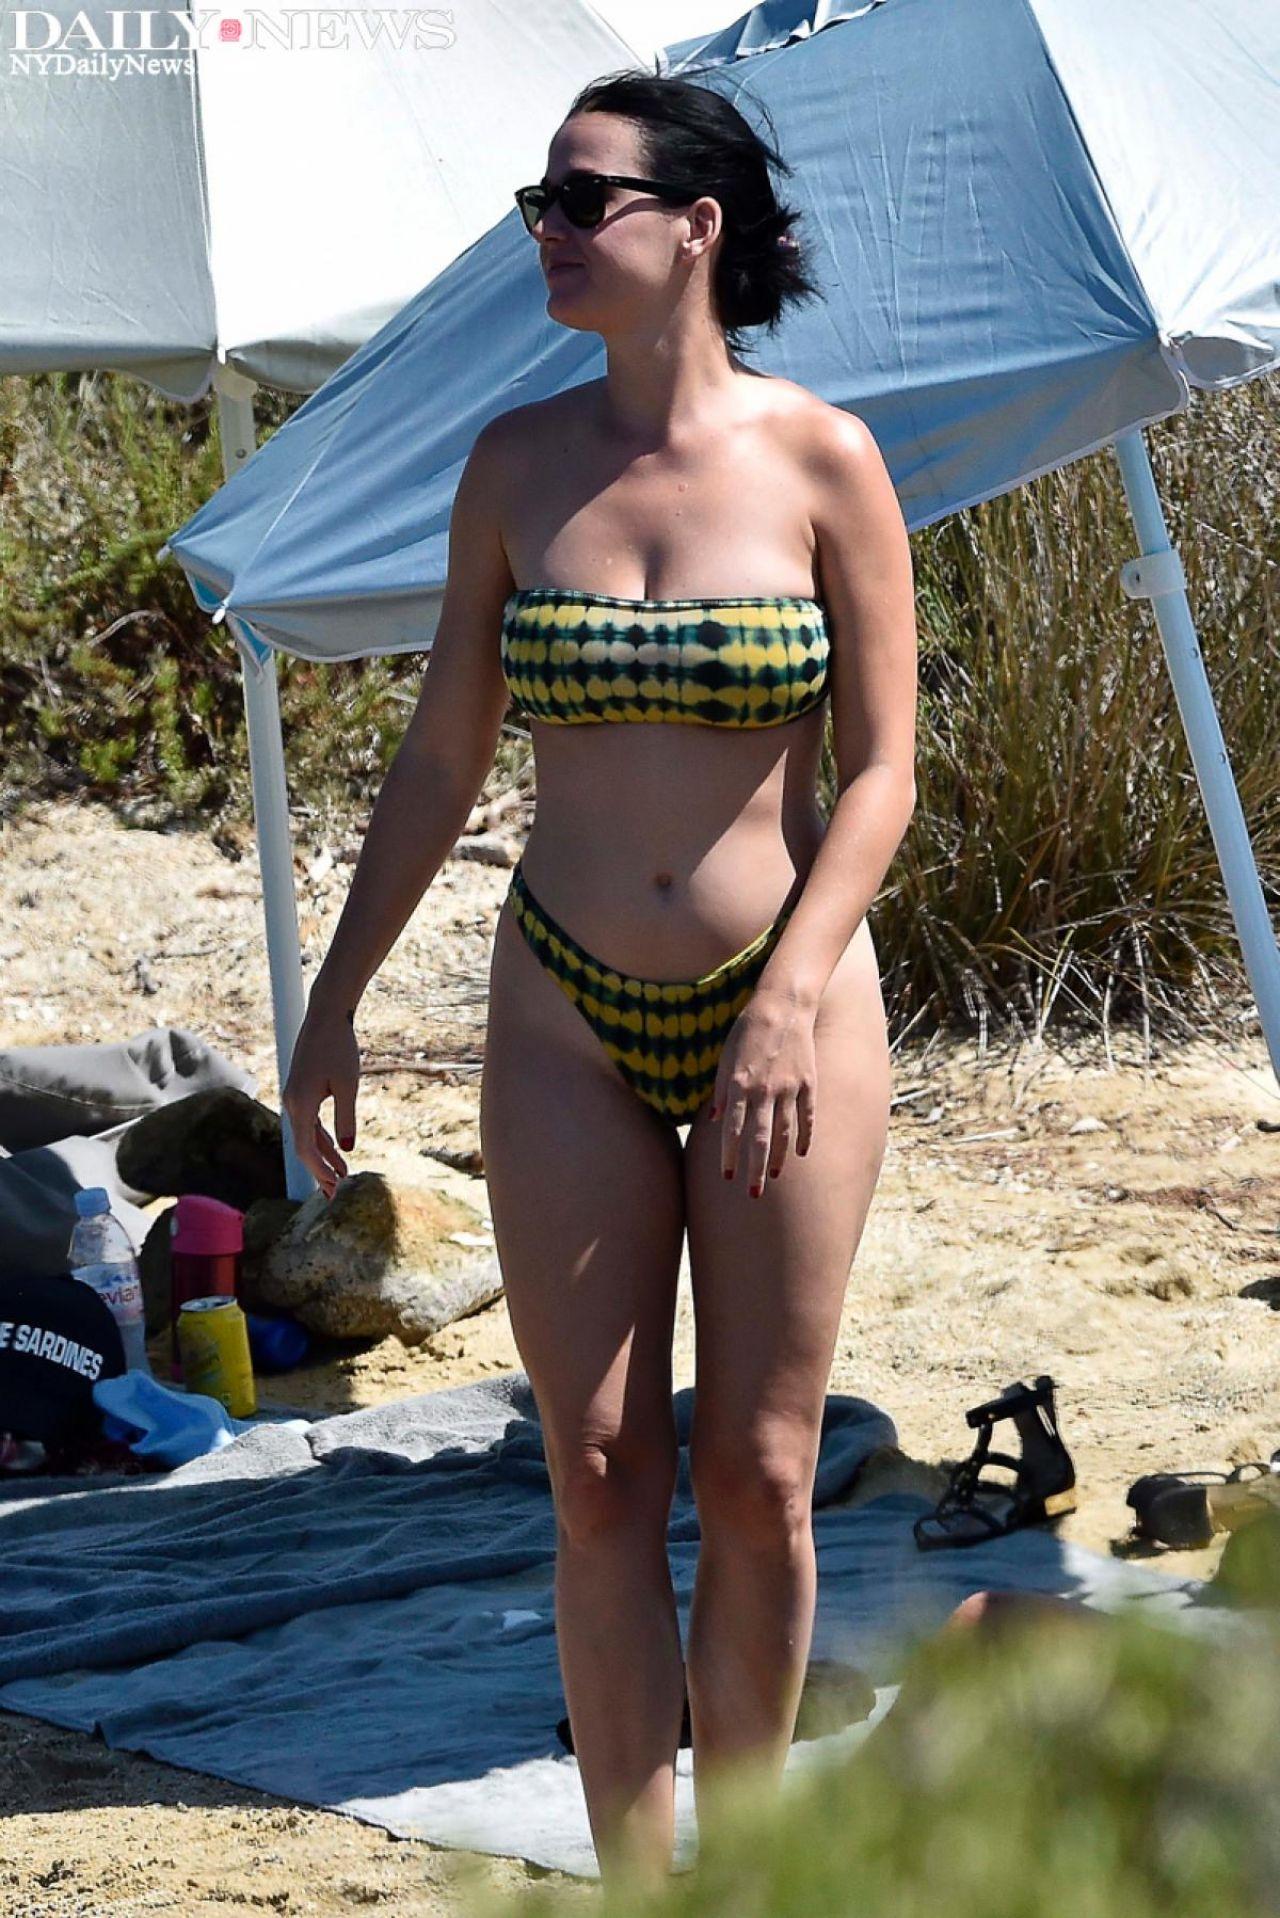 Katy Perry Bikini Photos Beach In Italy 8 3 2016